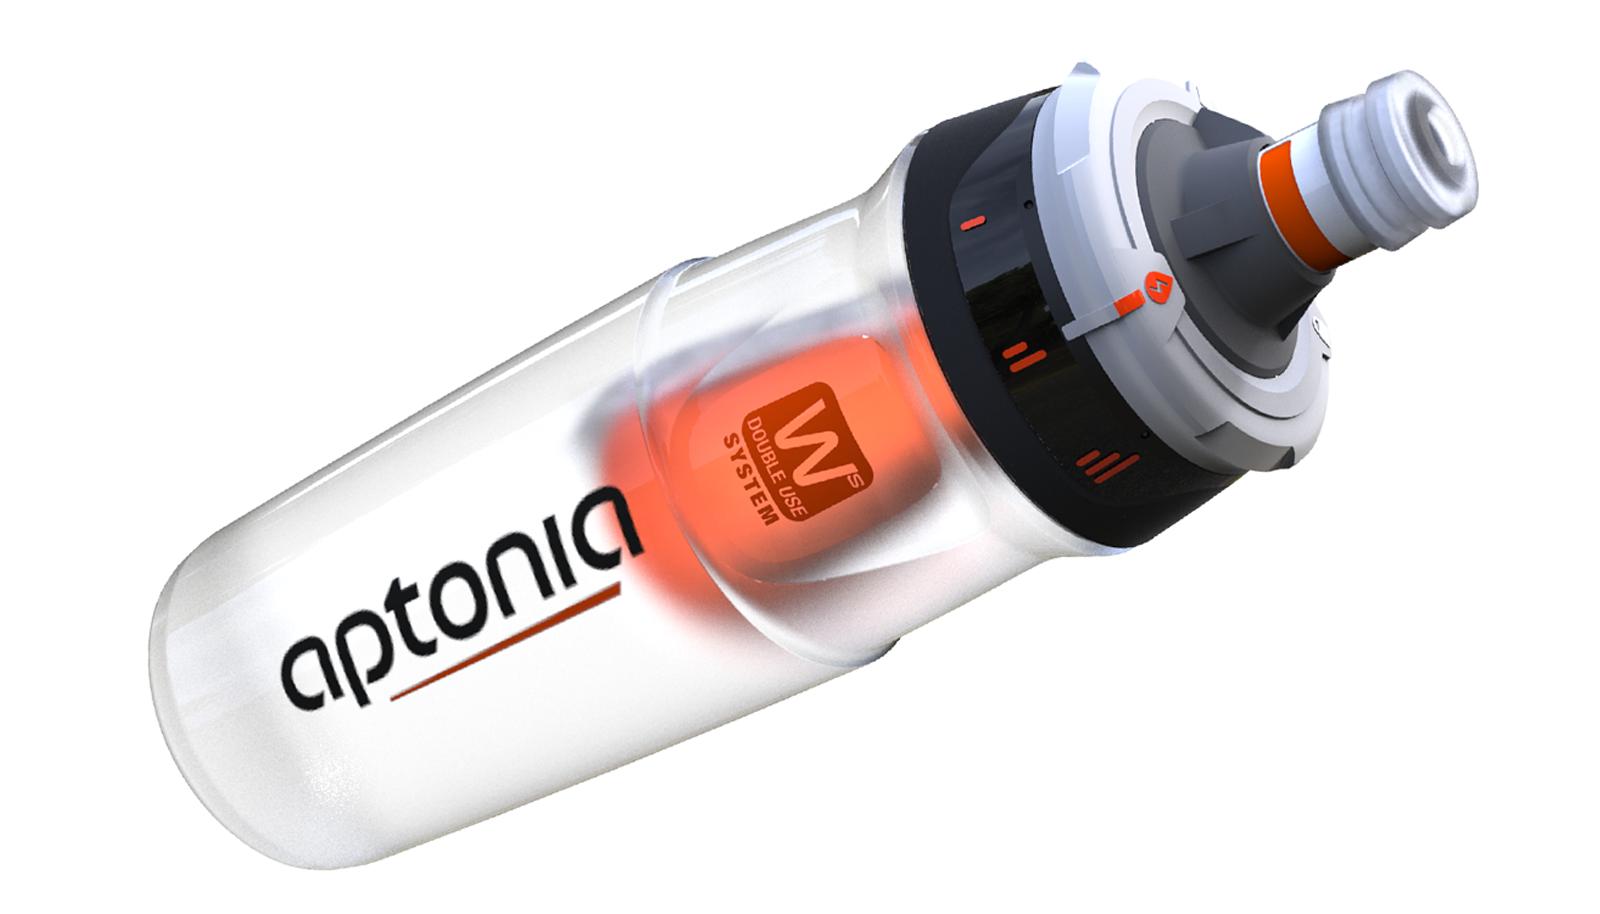 bidon Double Use System aptonia innovation awards 2015 decathlon